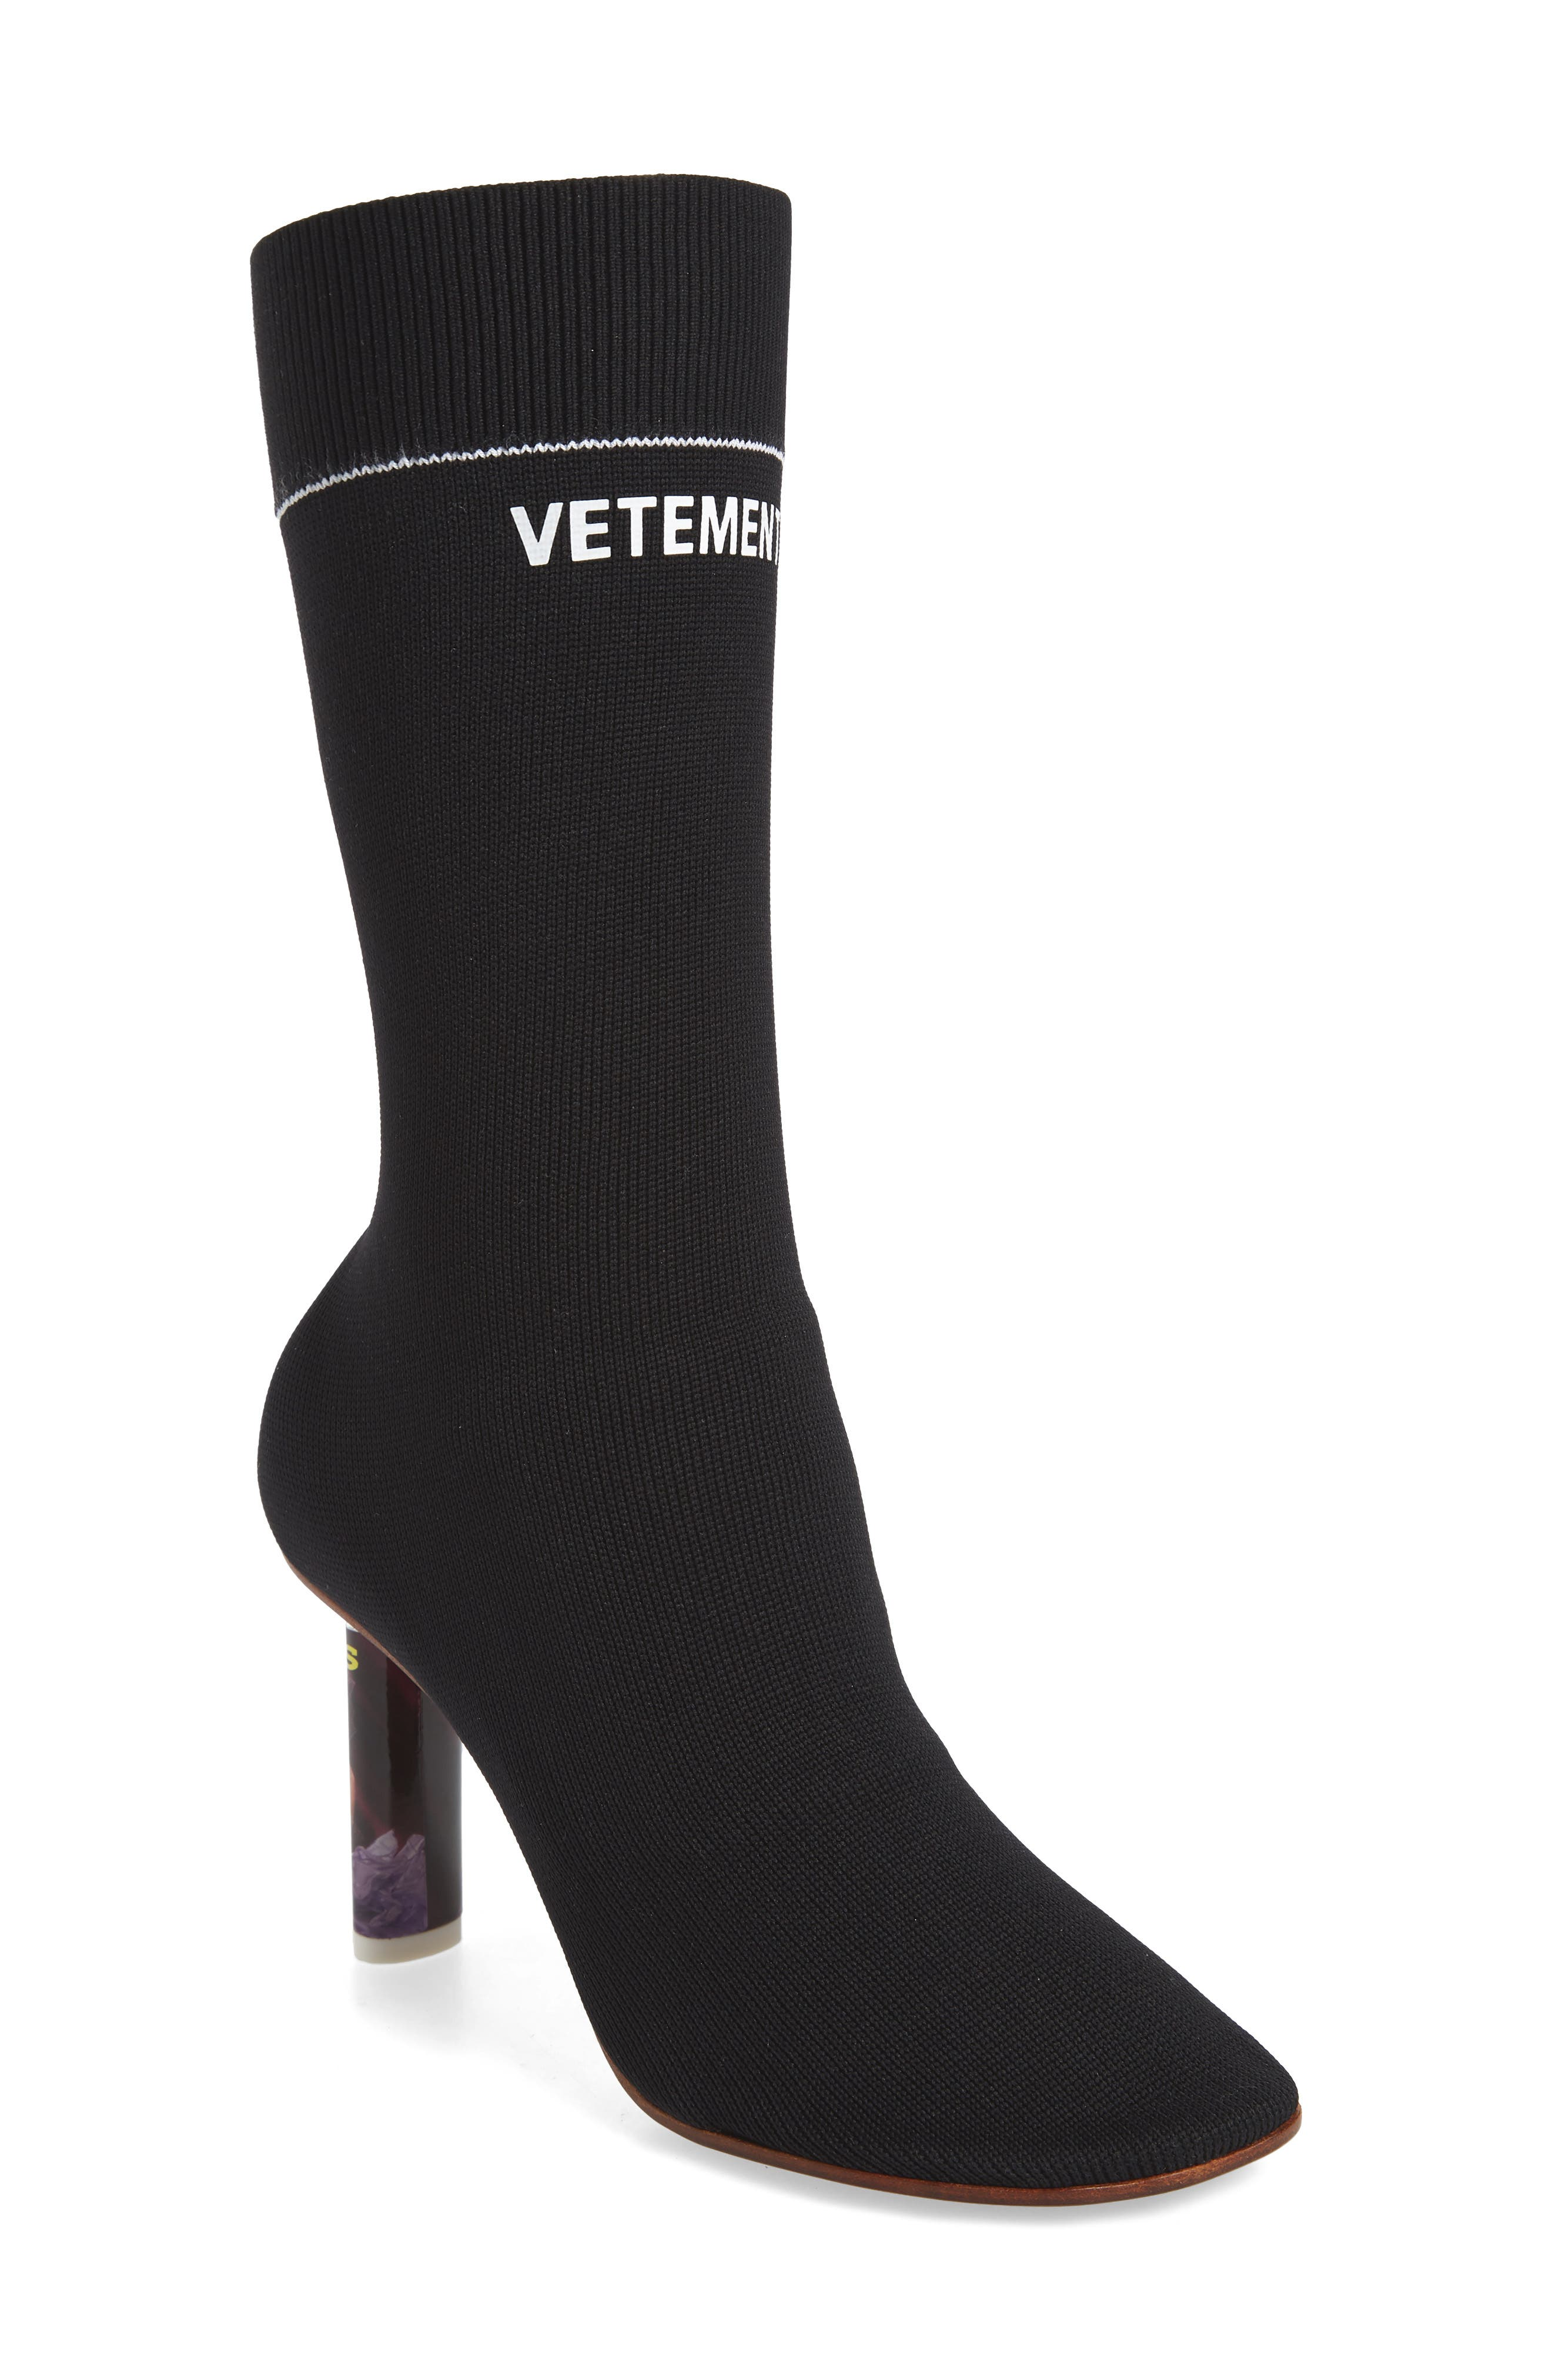 Lighter Sock Boot,                         Main,                         color, Black/Printed Heel